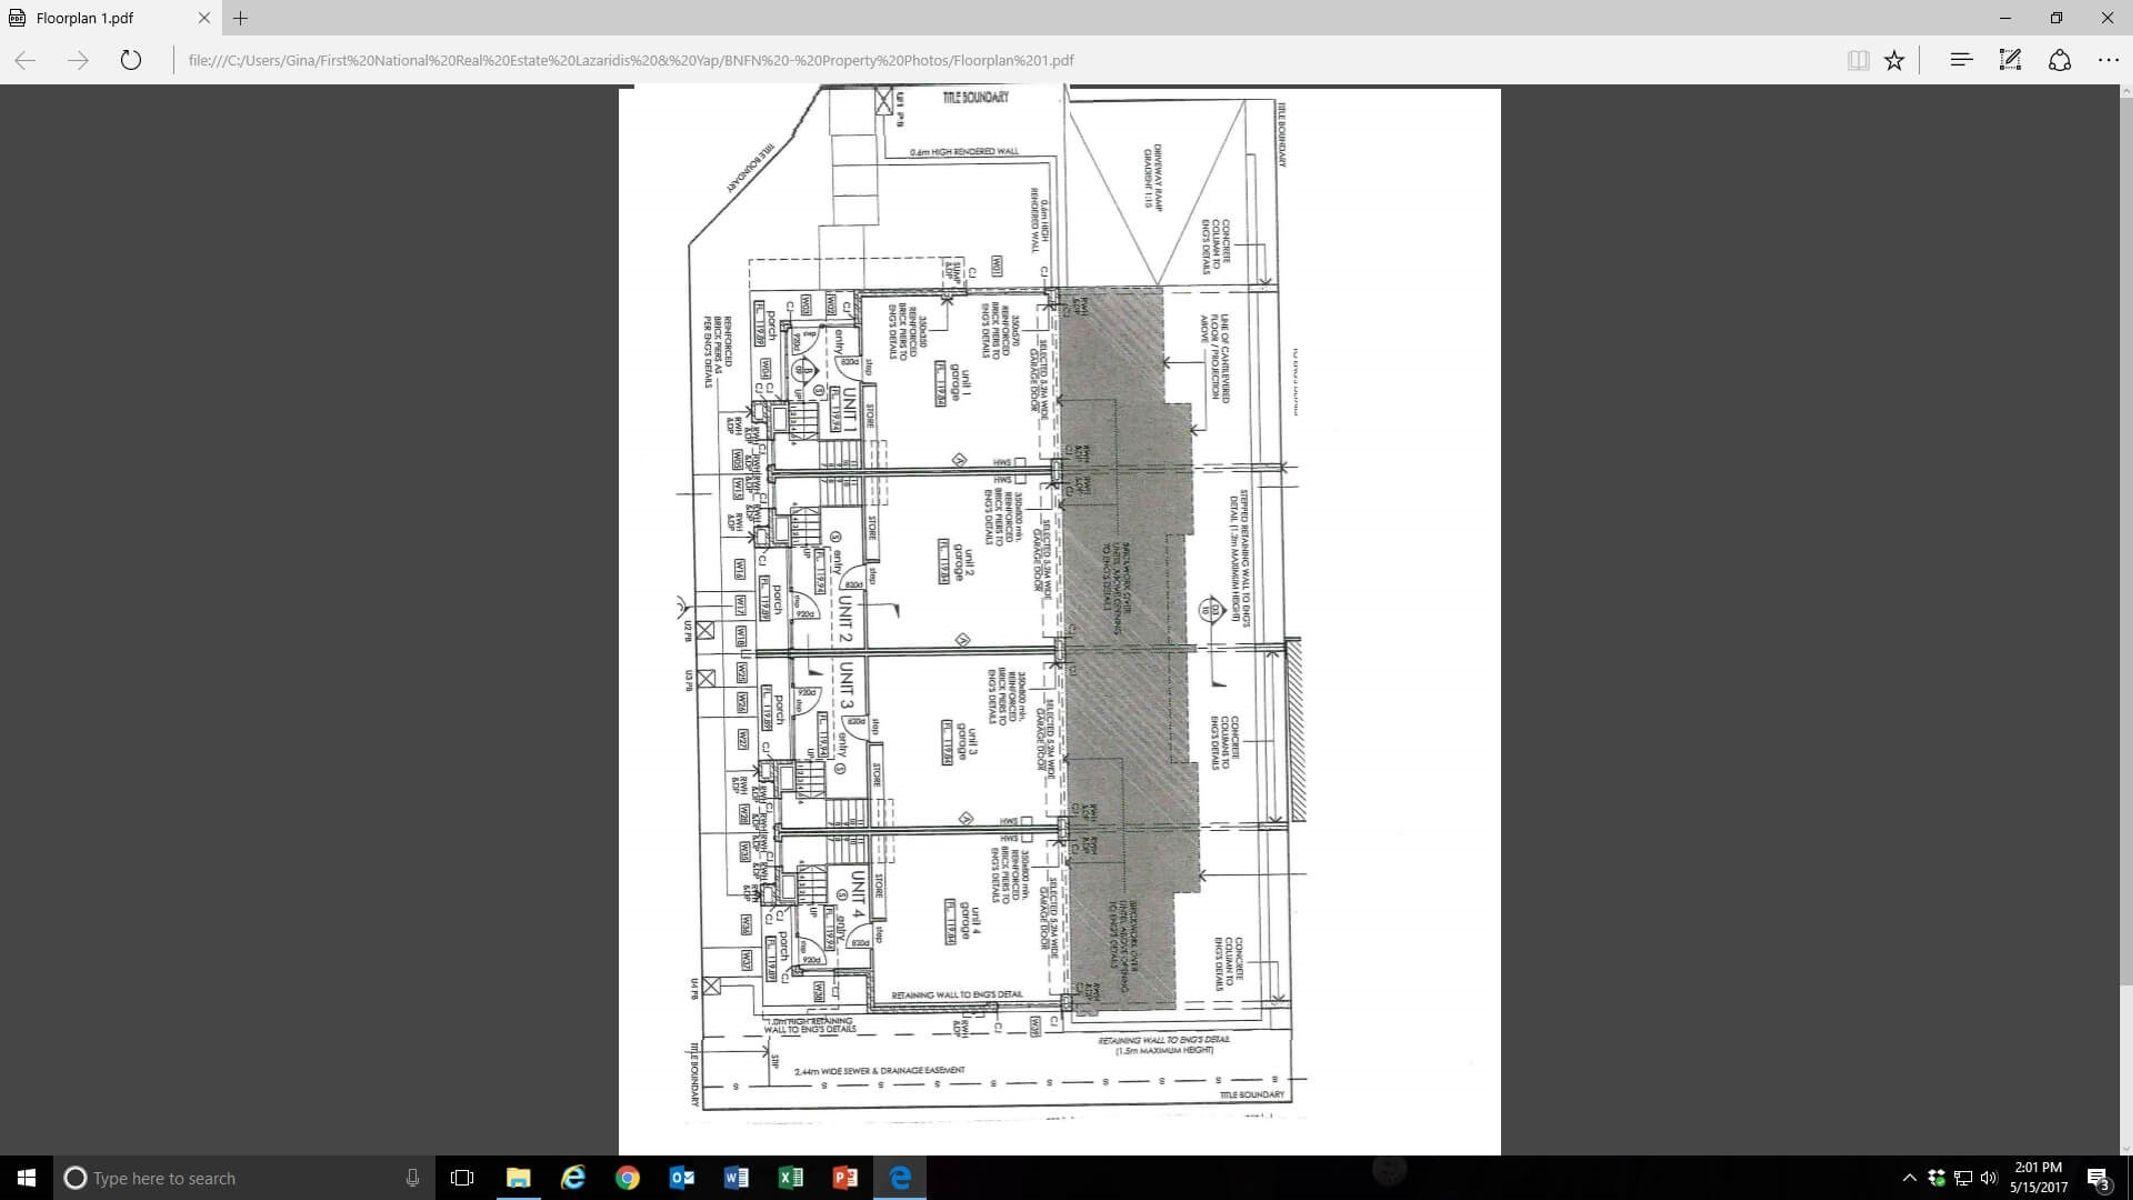 3 1067 doncaster rd doncaster east vic 3109 australia townhouse rh balwynnorthfn com au